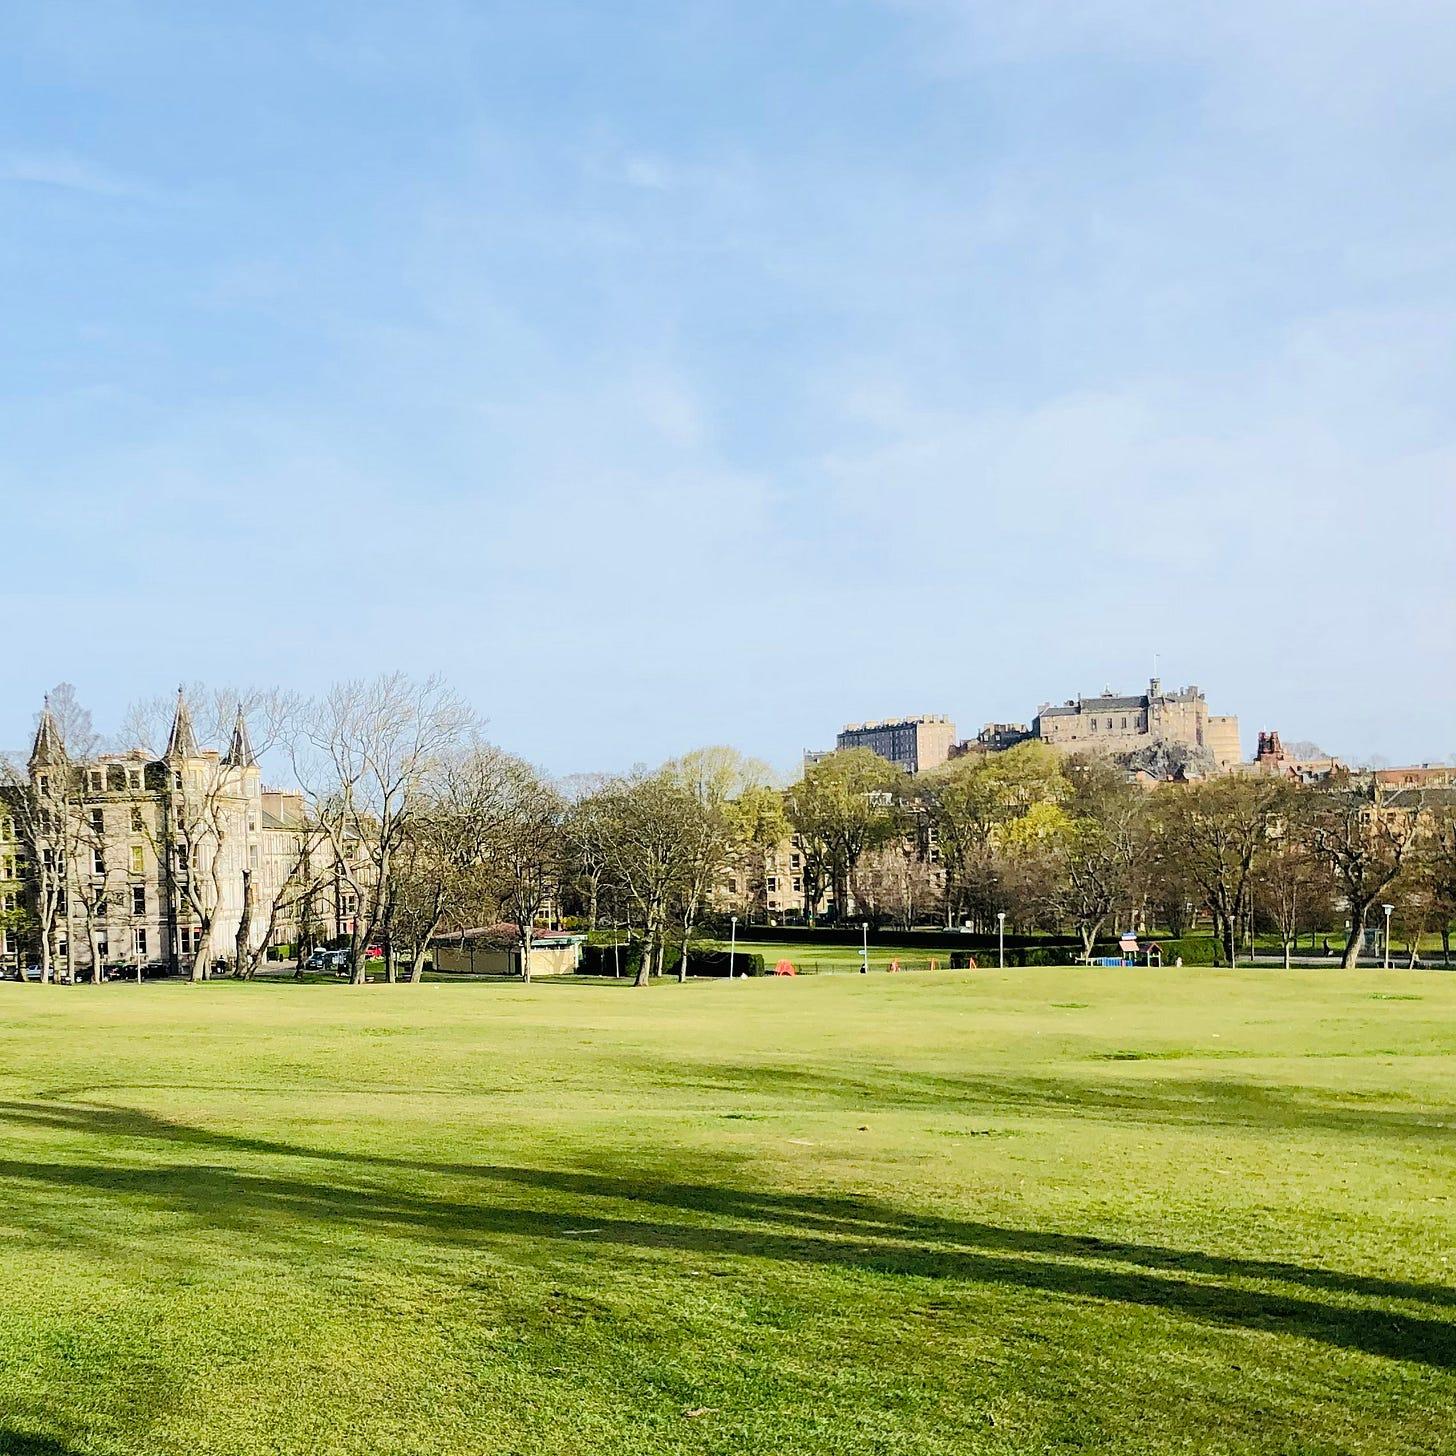 Image shows Edinburgh Castle, viewed from Bruntsfield Links